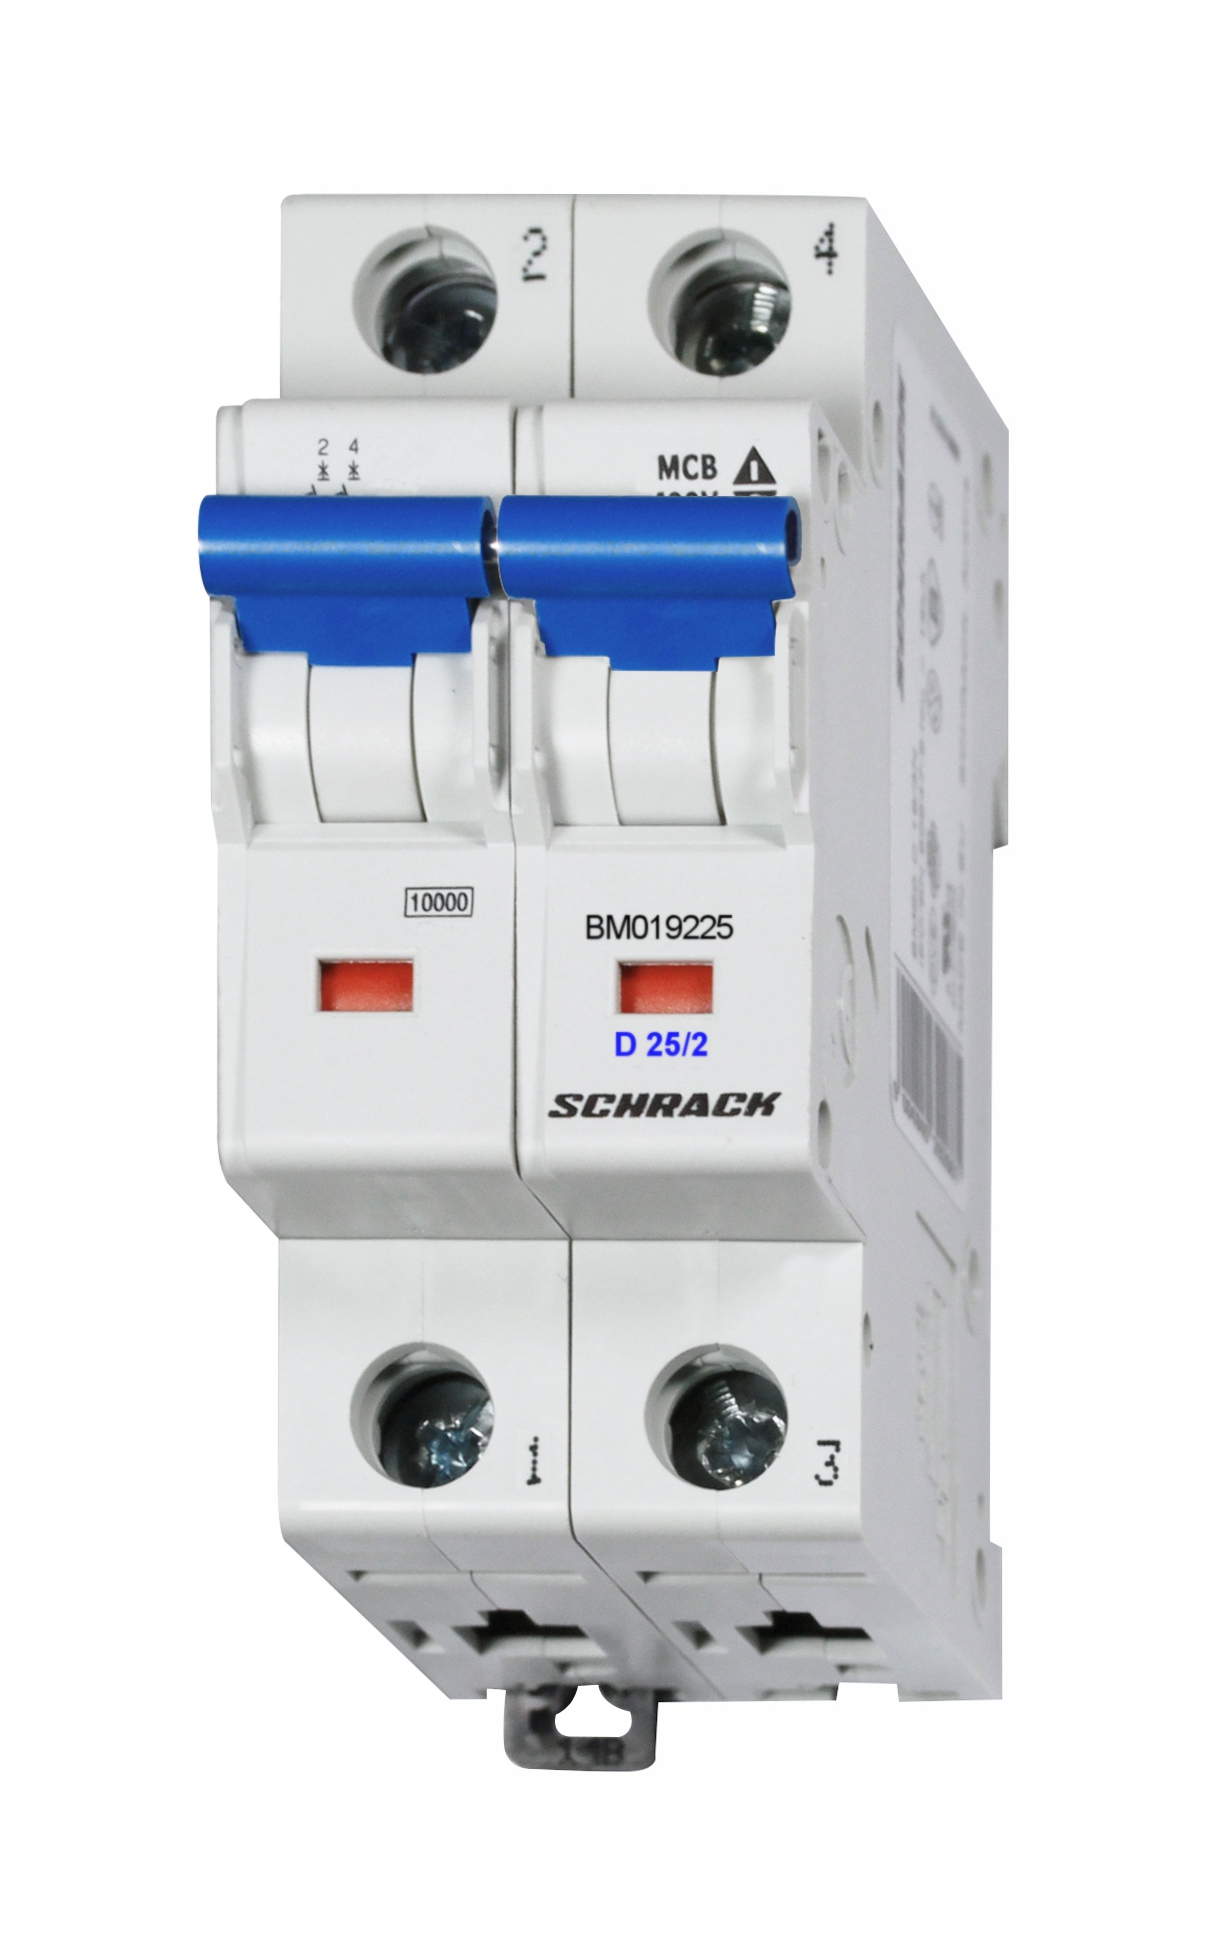 BM019225 - Schrack Technik